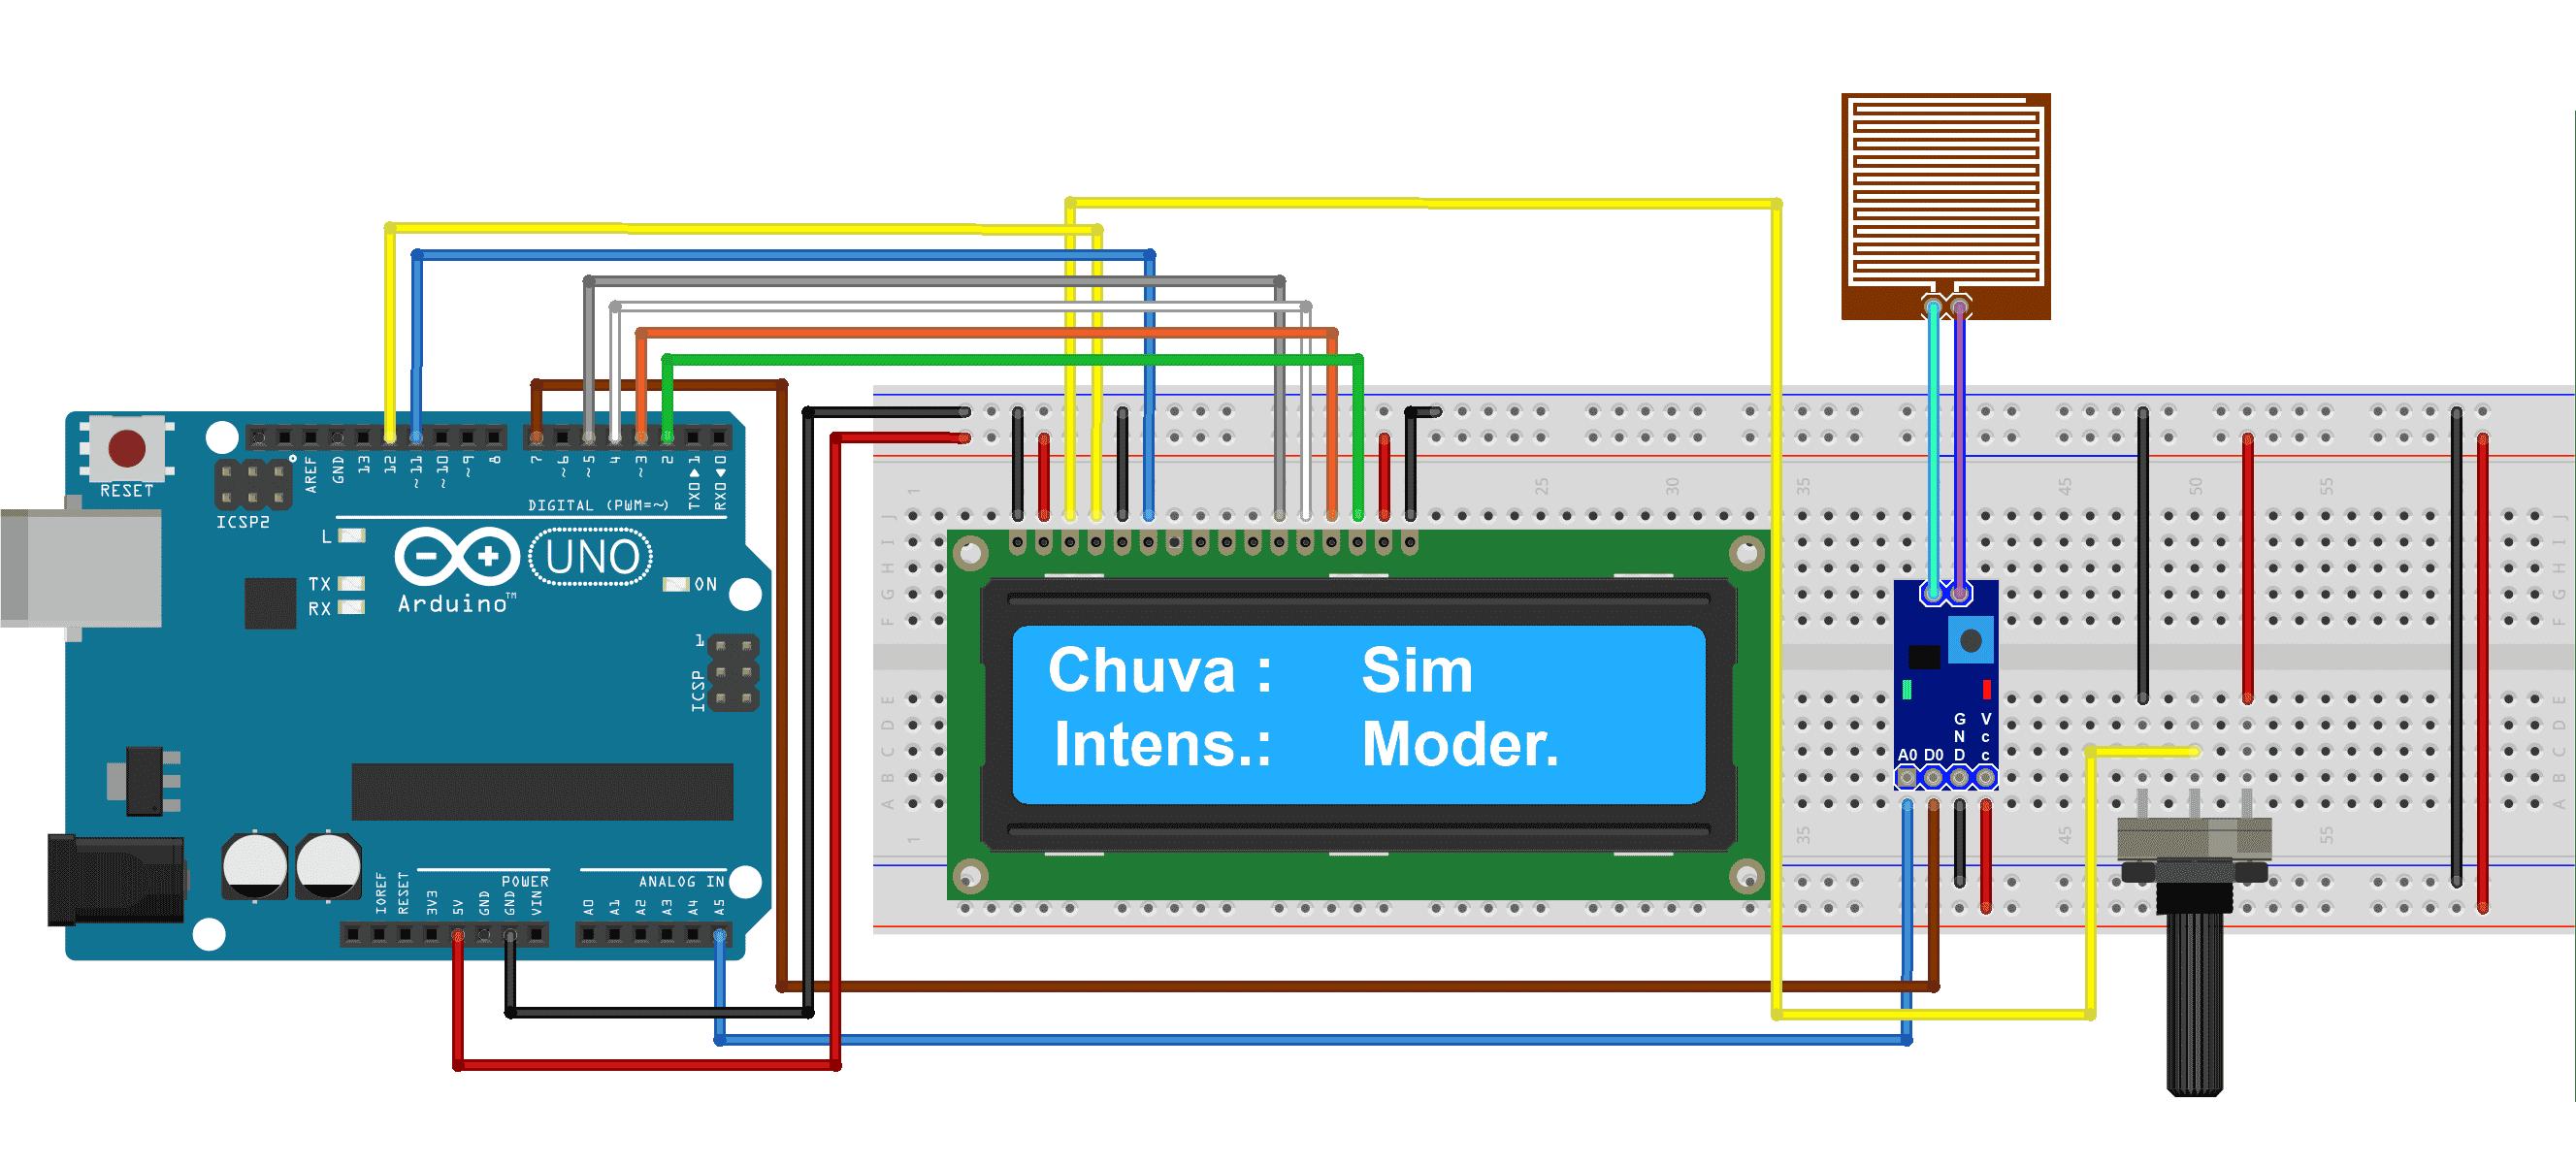 Circuito sensor de chuva e display LCD 16x2